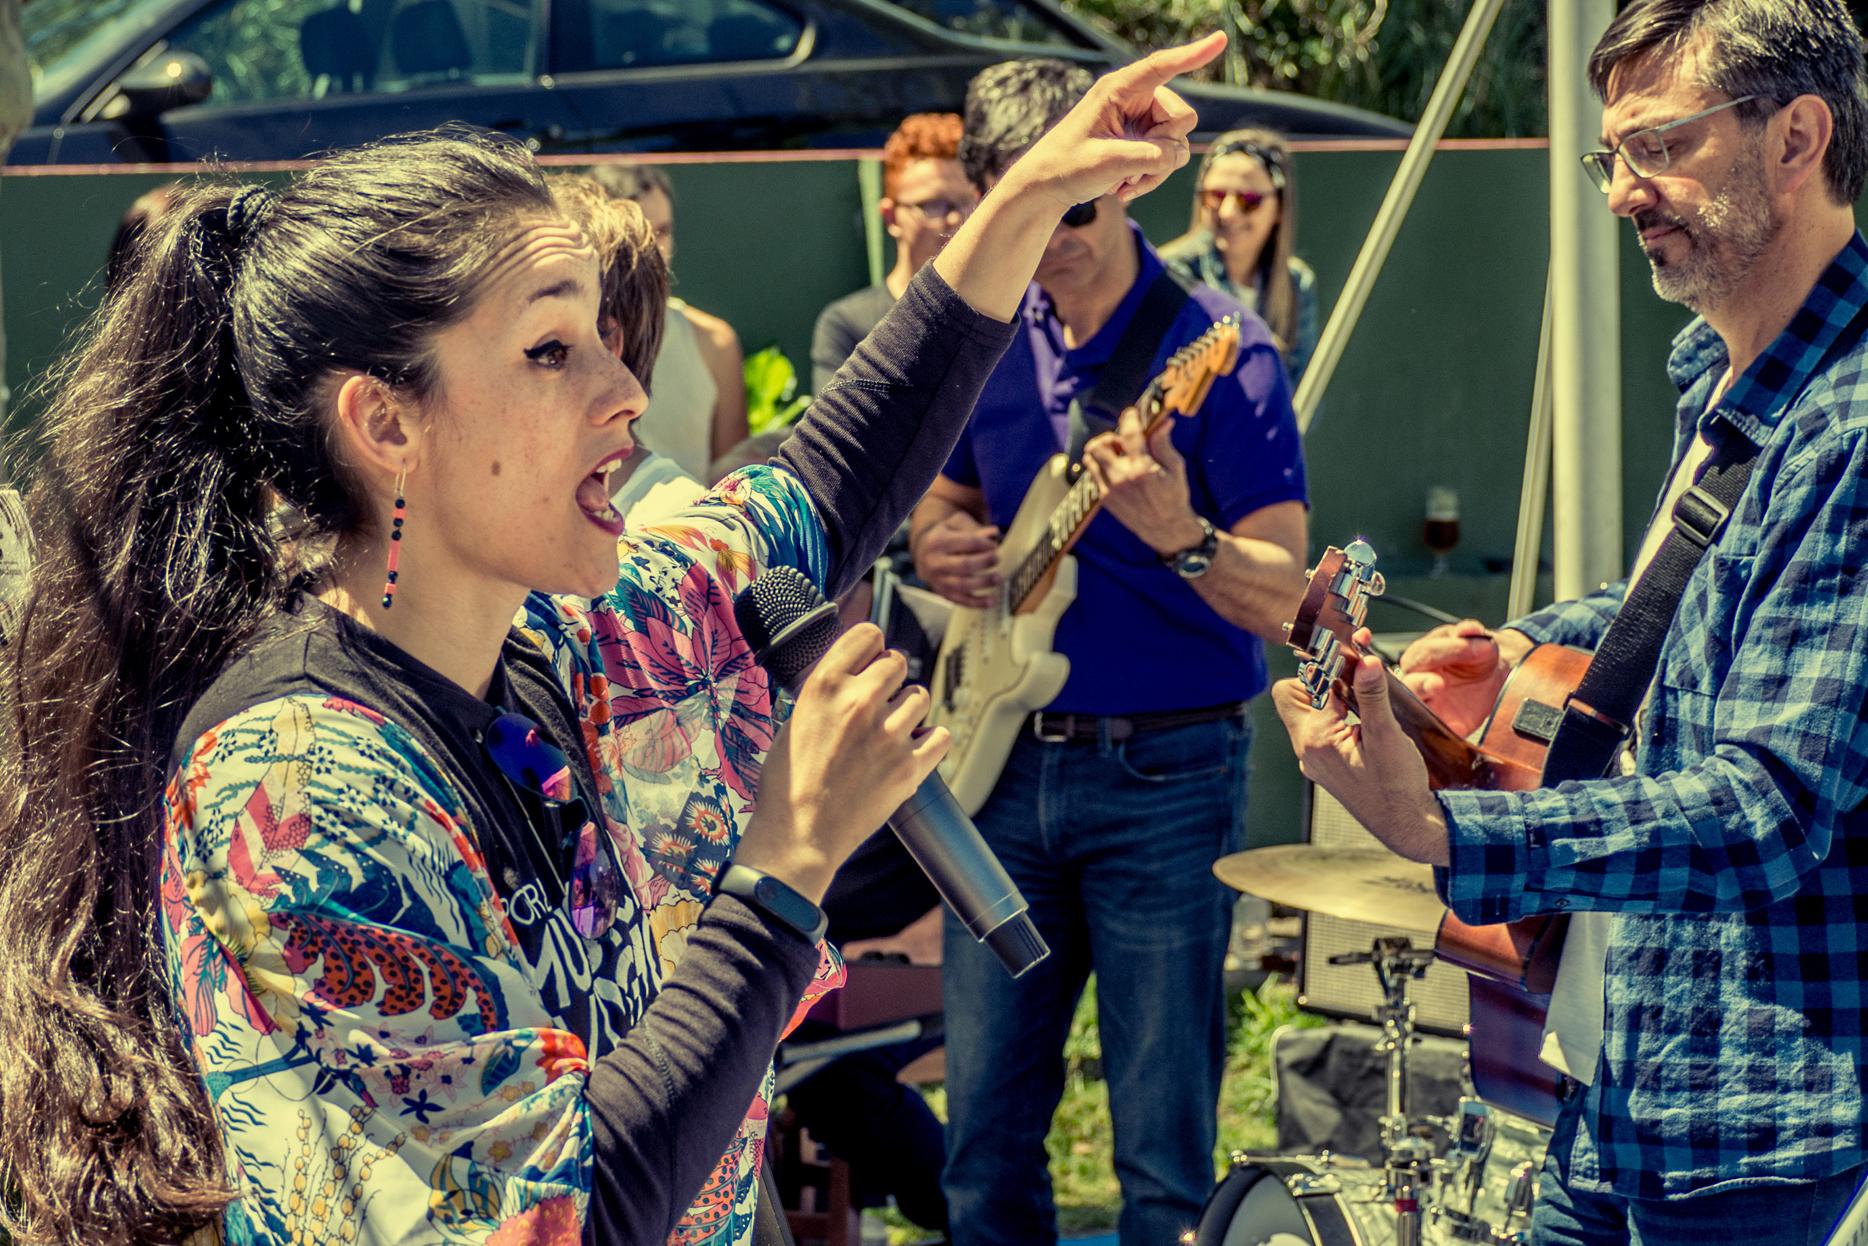 Noelia, Festival Fin de Curso Gain Over